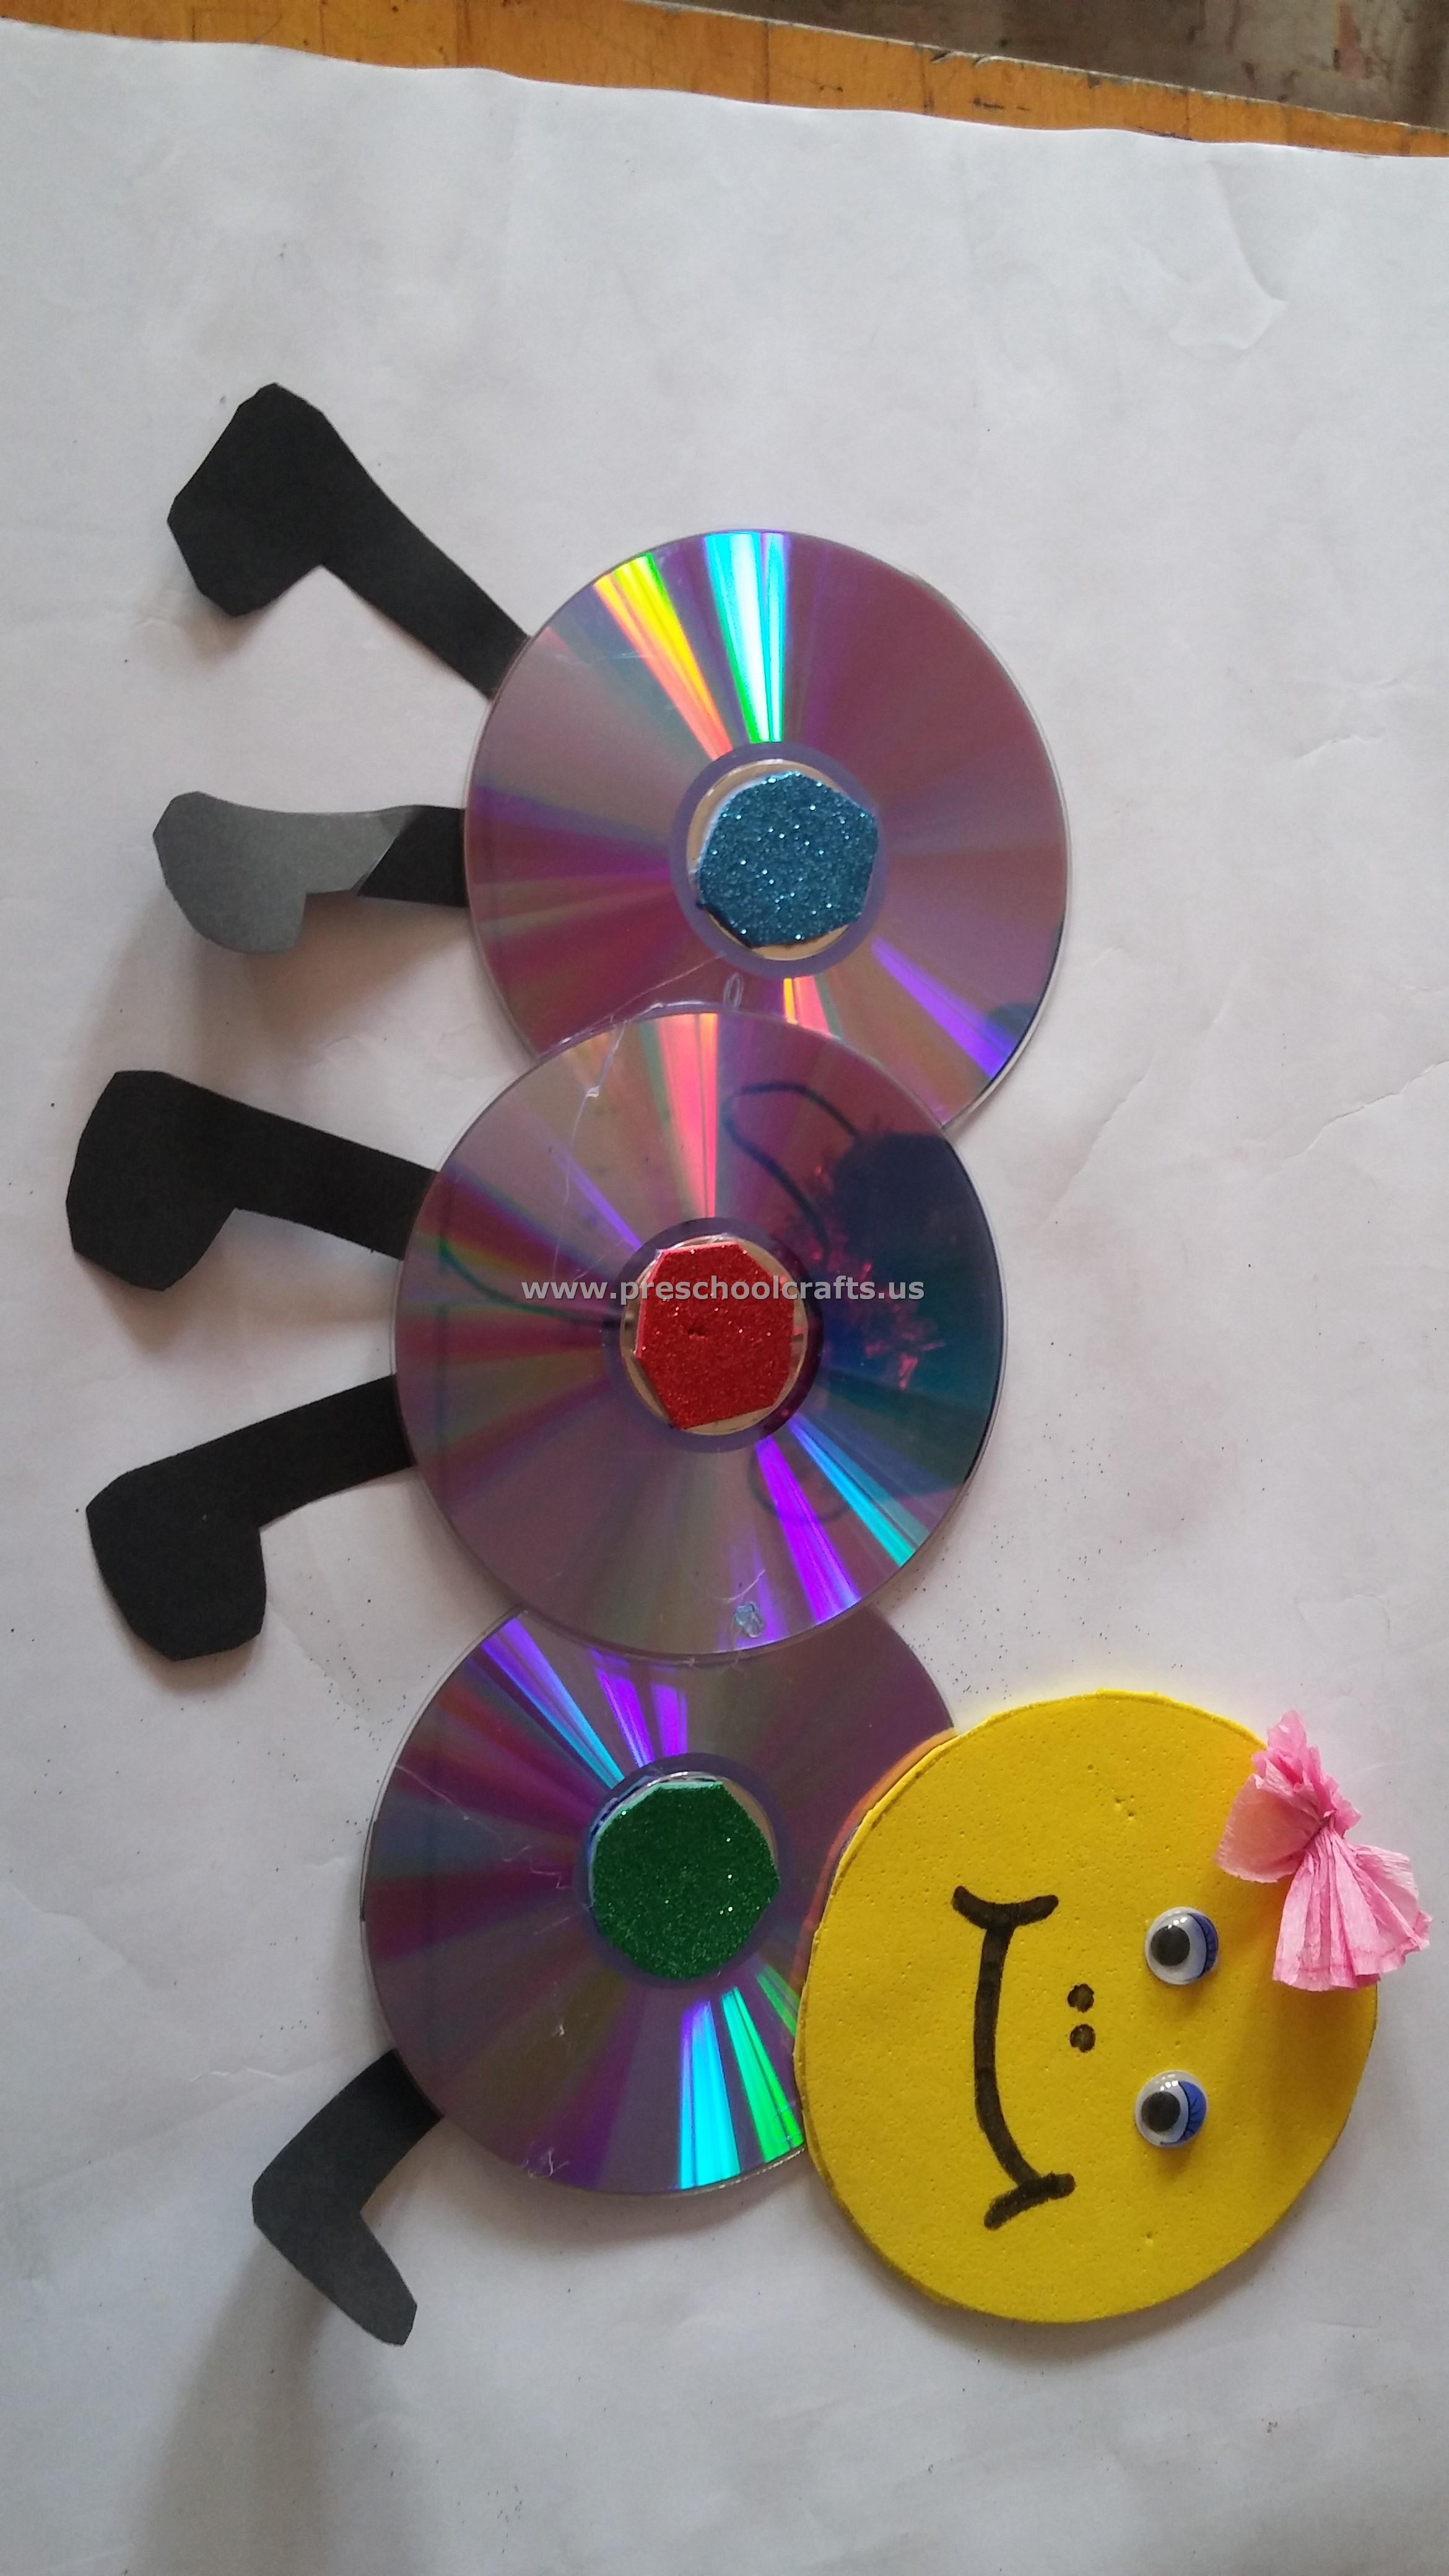 cd-craft-for-preschool - Preschool Crafts